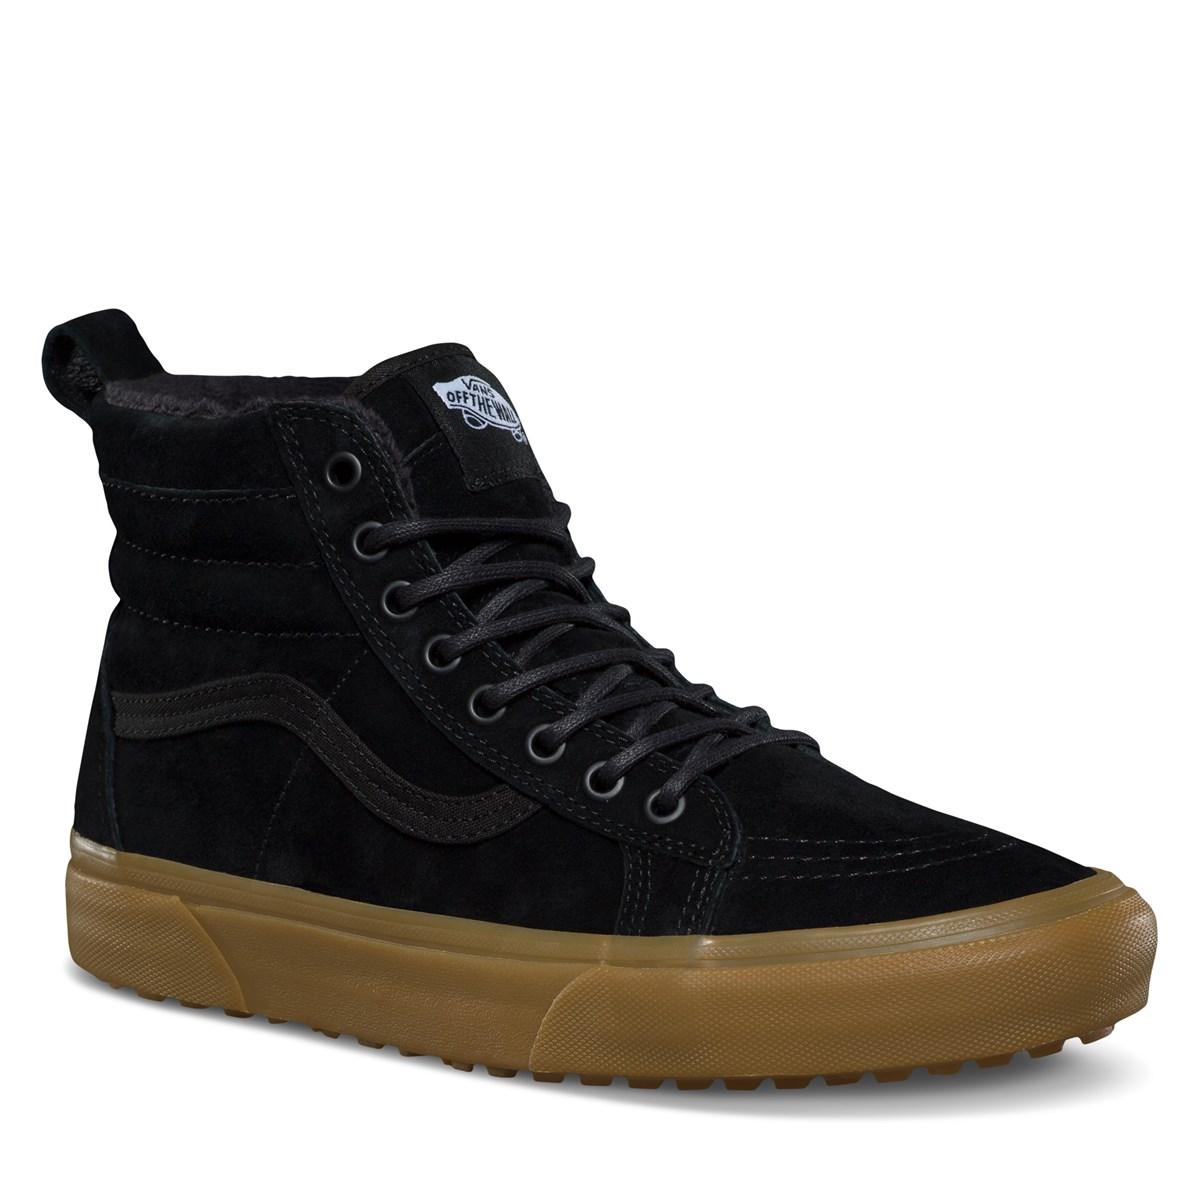 Men's SK8 Hi MTE Sneakers in Black